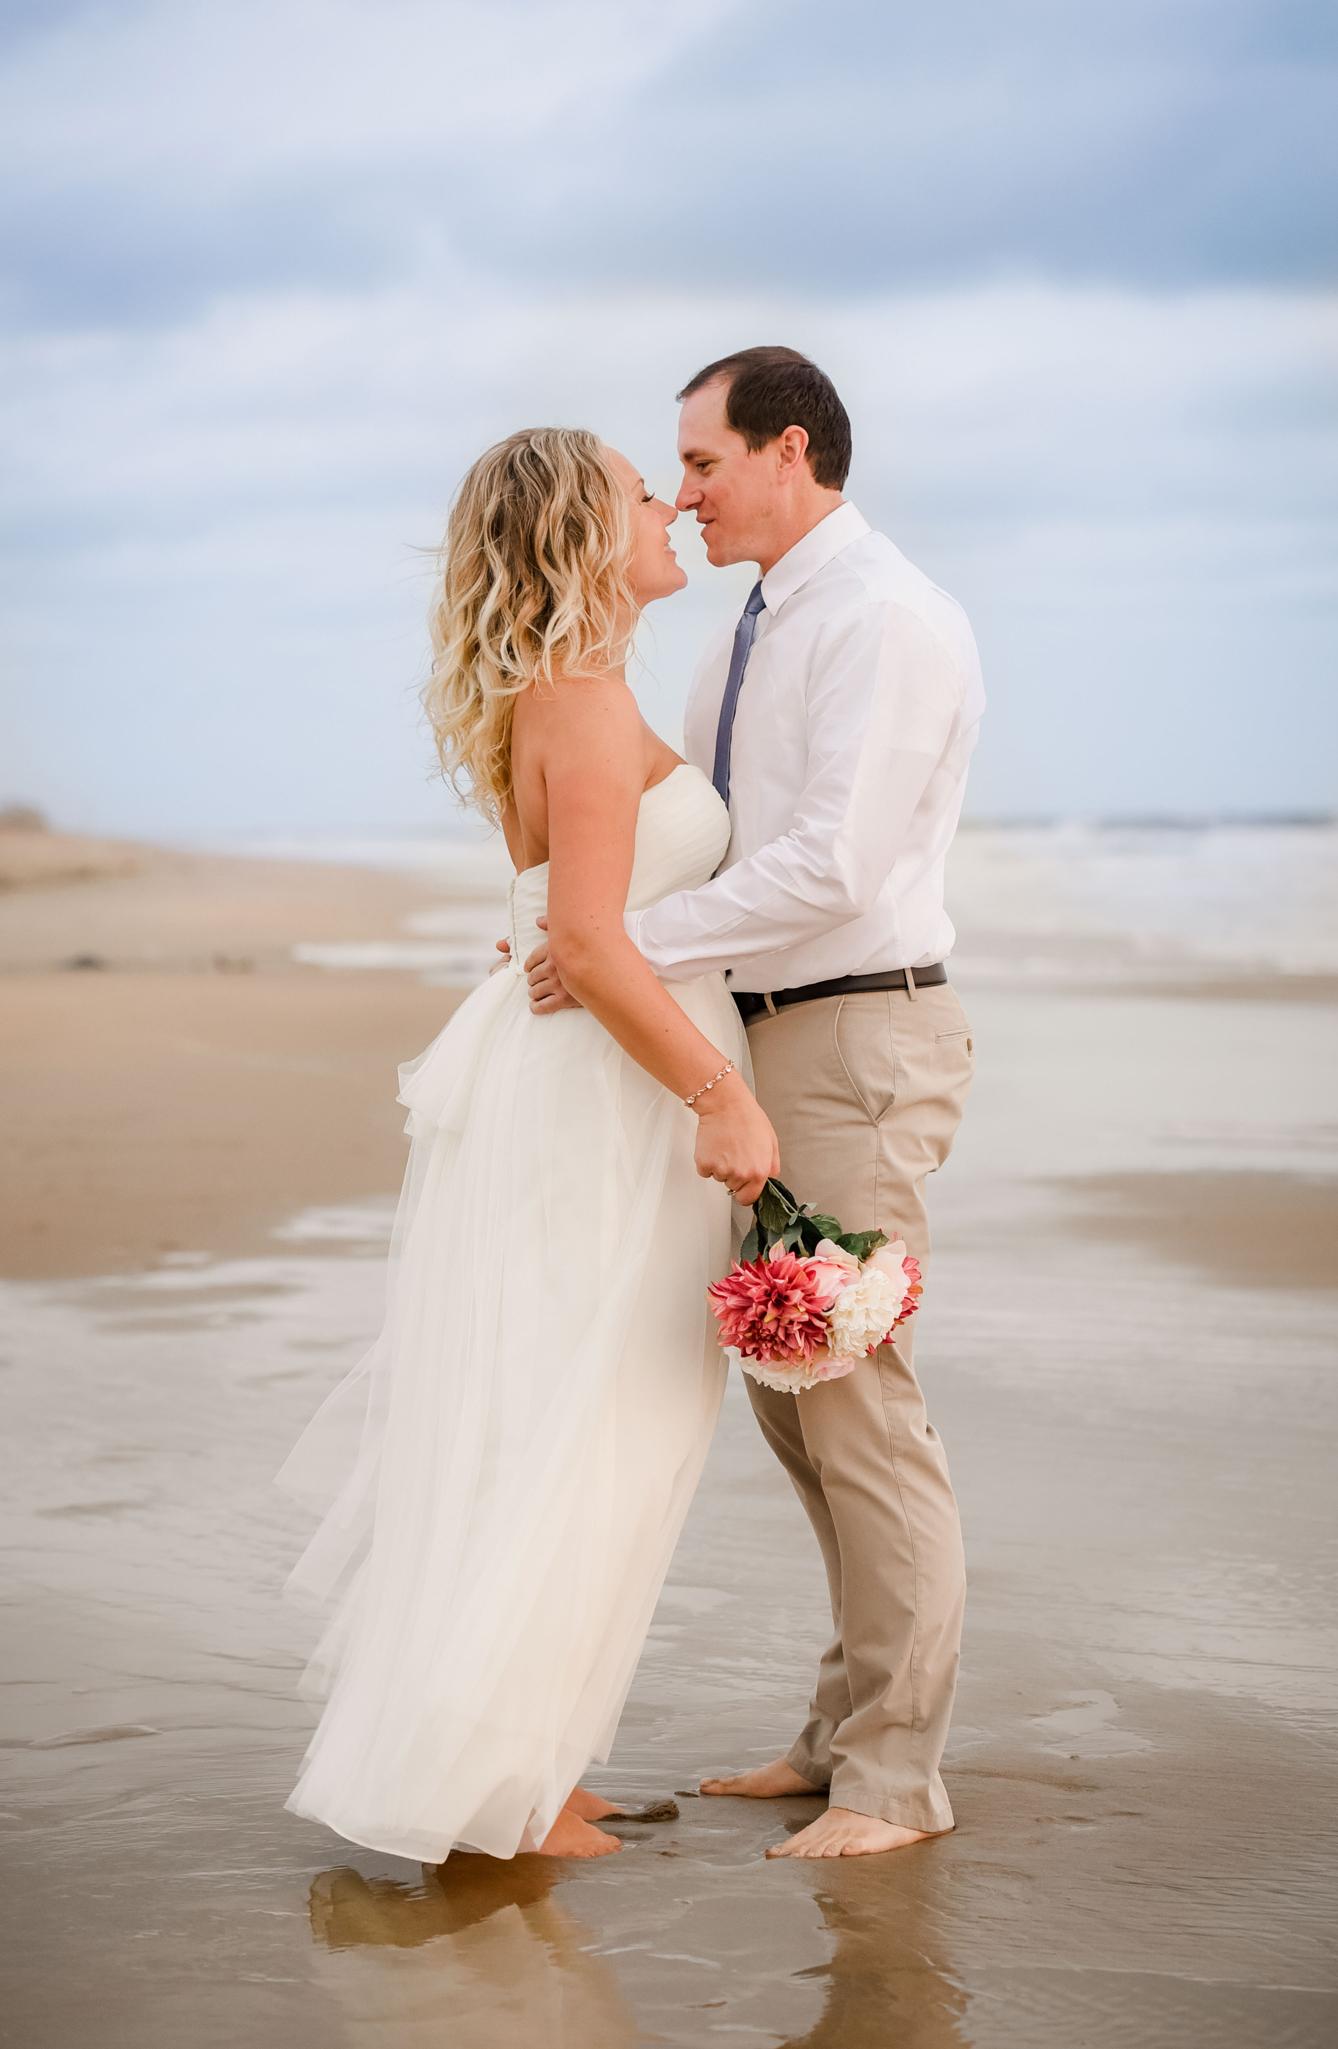 virginia-beach-documentary-wedding-photographer-top-wedding-pros-hampton-roads-norfolk-chesapeake-suffolk-sandbridge-elopement-engagment-wedding-photographers